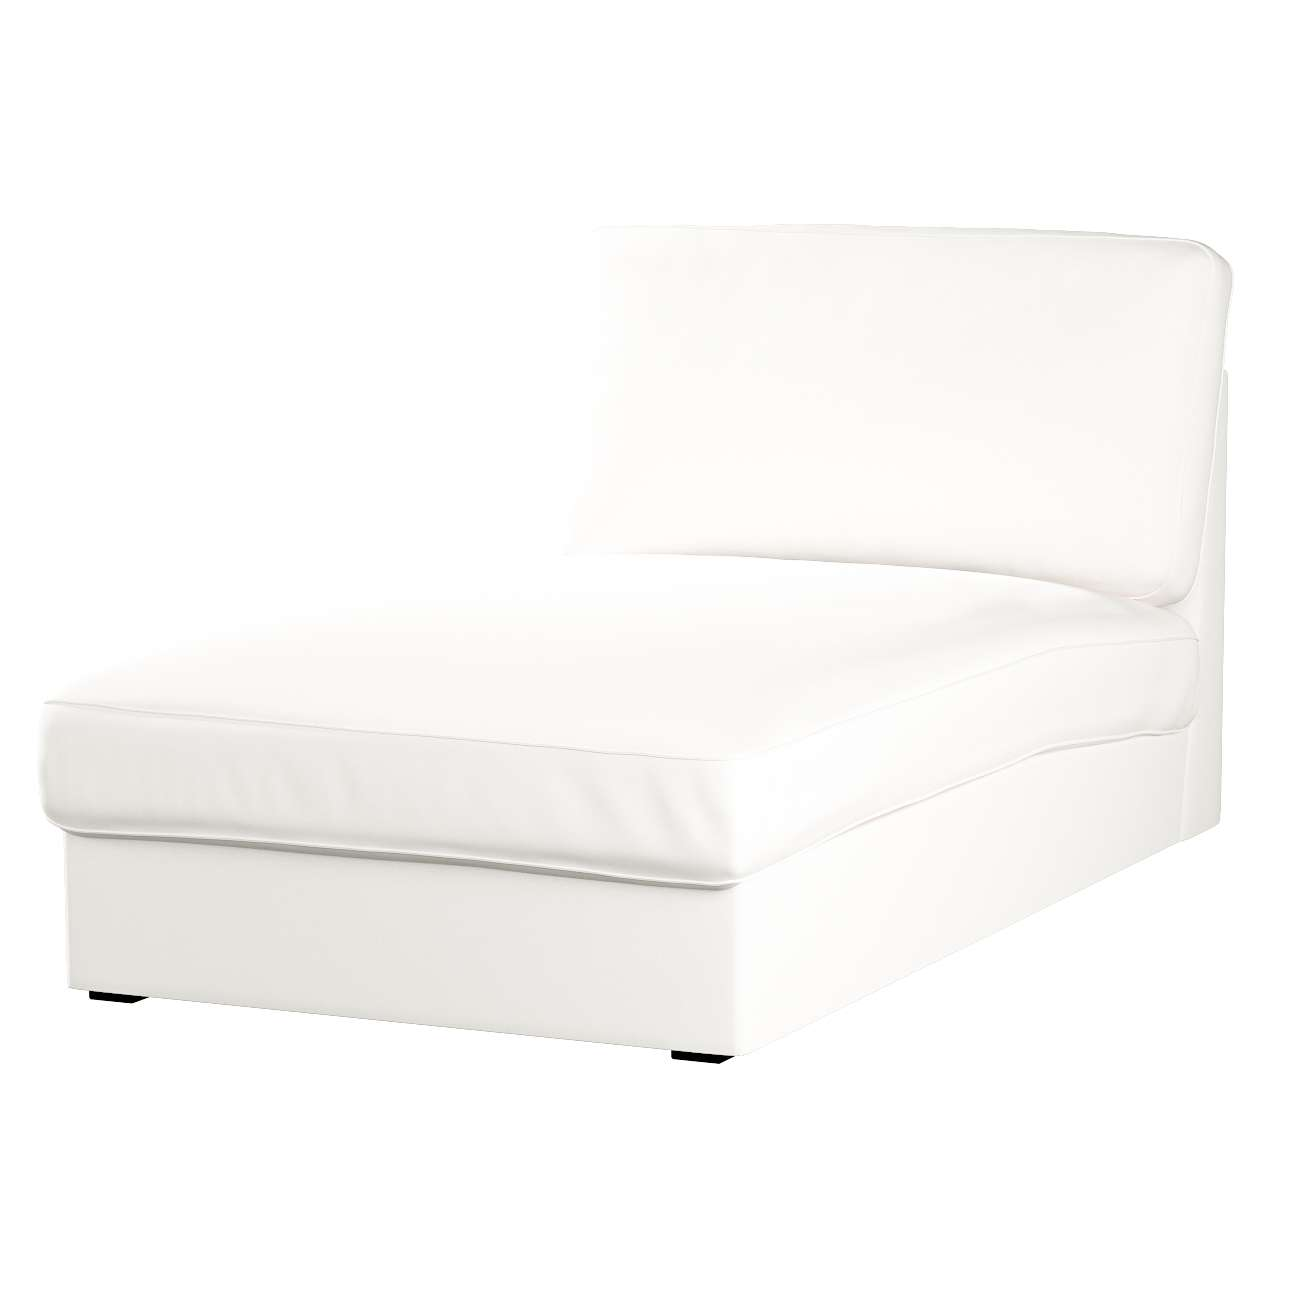 Kivik Recamiere Sofabezug Kivik Recamiere von der Kollektion Cotton Panama, Stoff: 702-34